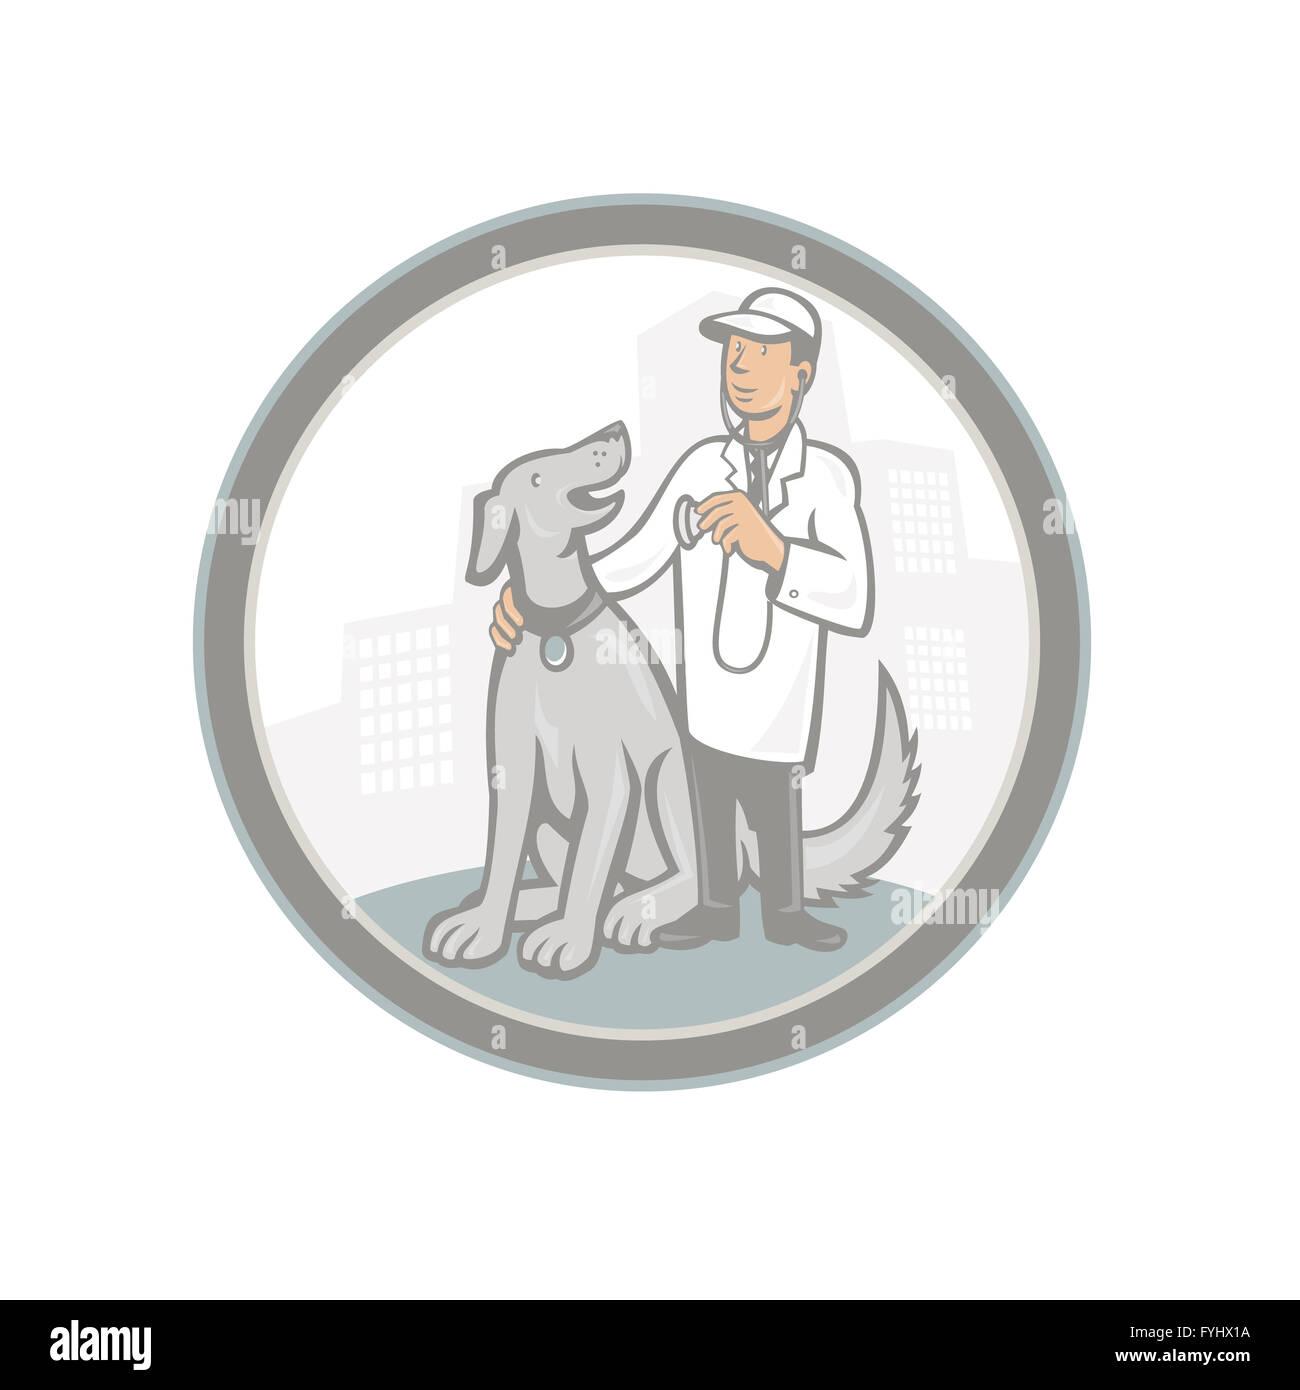 Veterinarian Vet With Pet Dog Cartoon - Stock Image